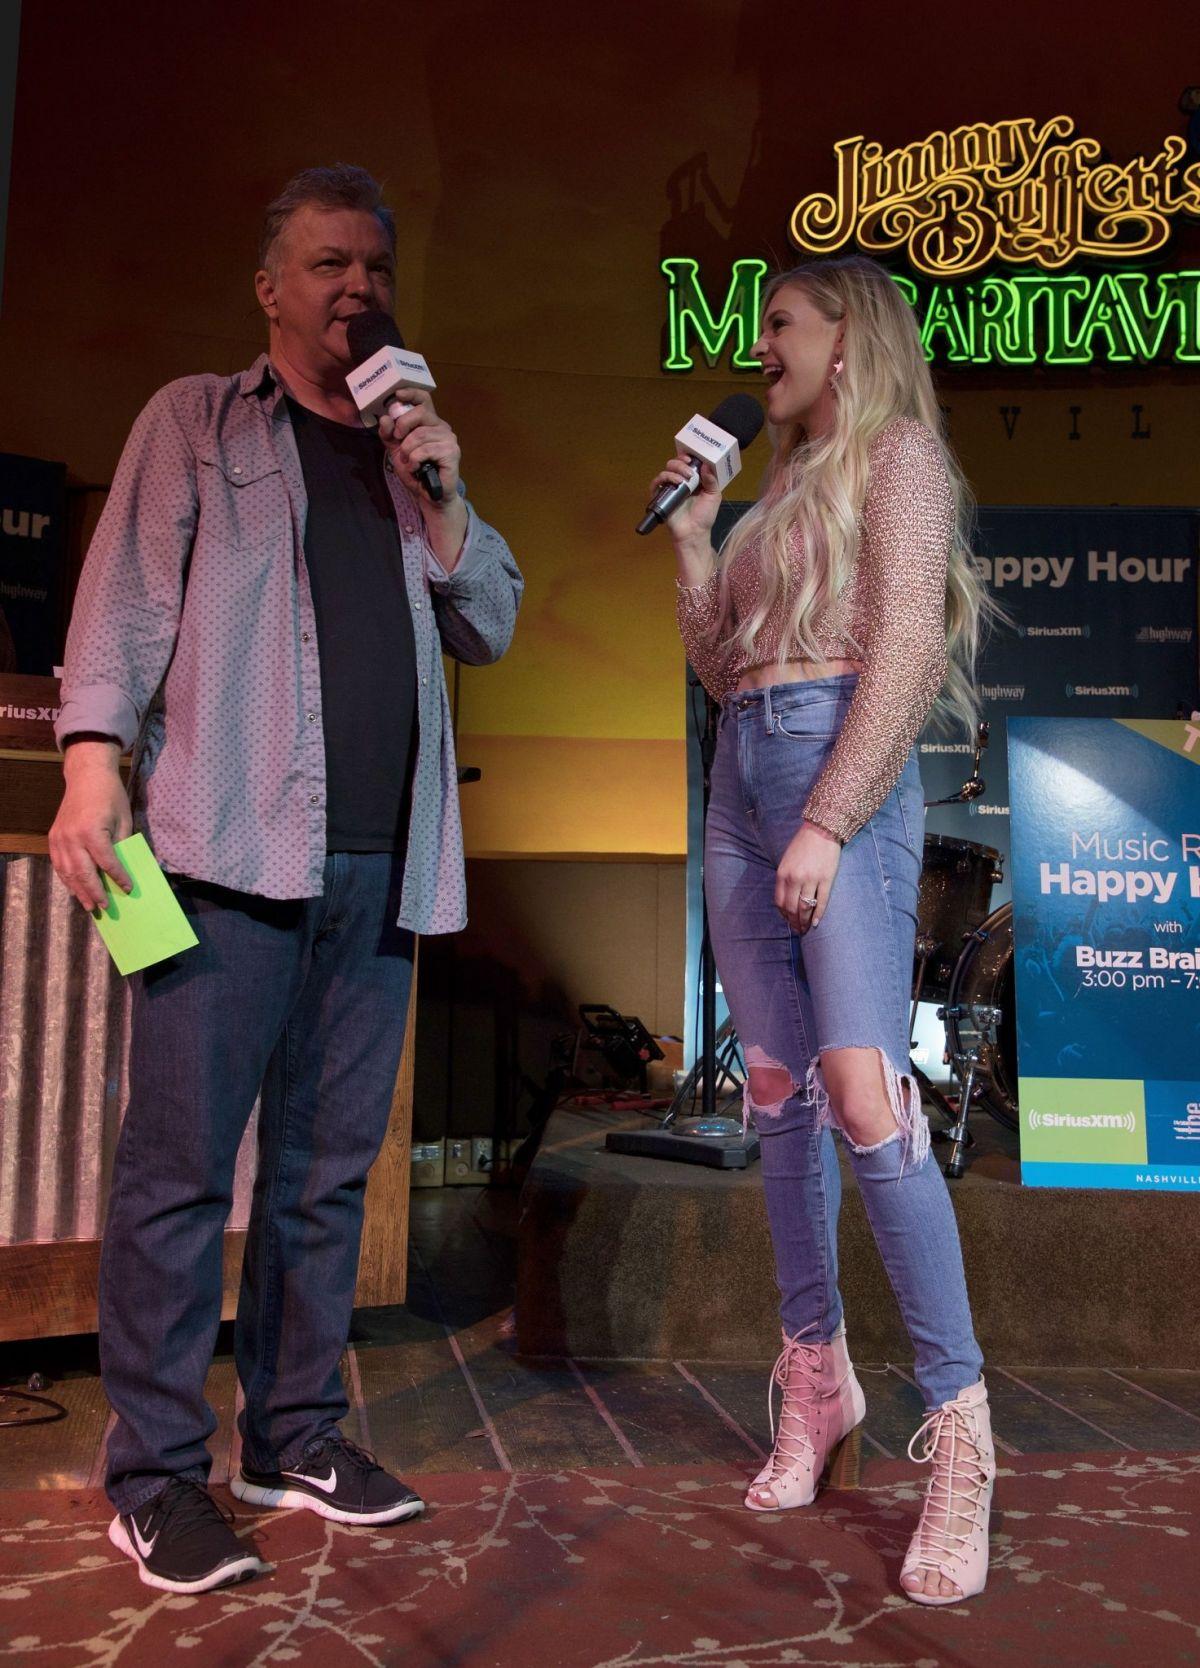 KELSEA BALLERINI at SiriusXM's Music Row Happy Hour Live in